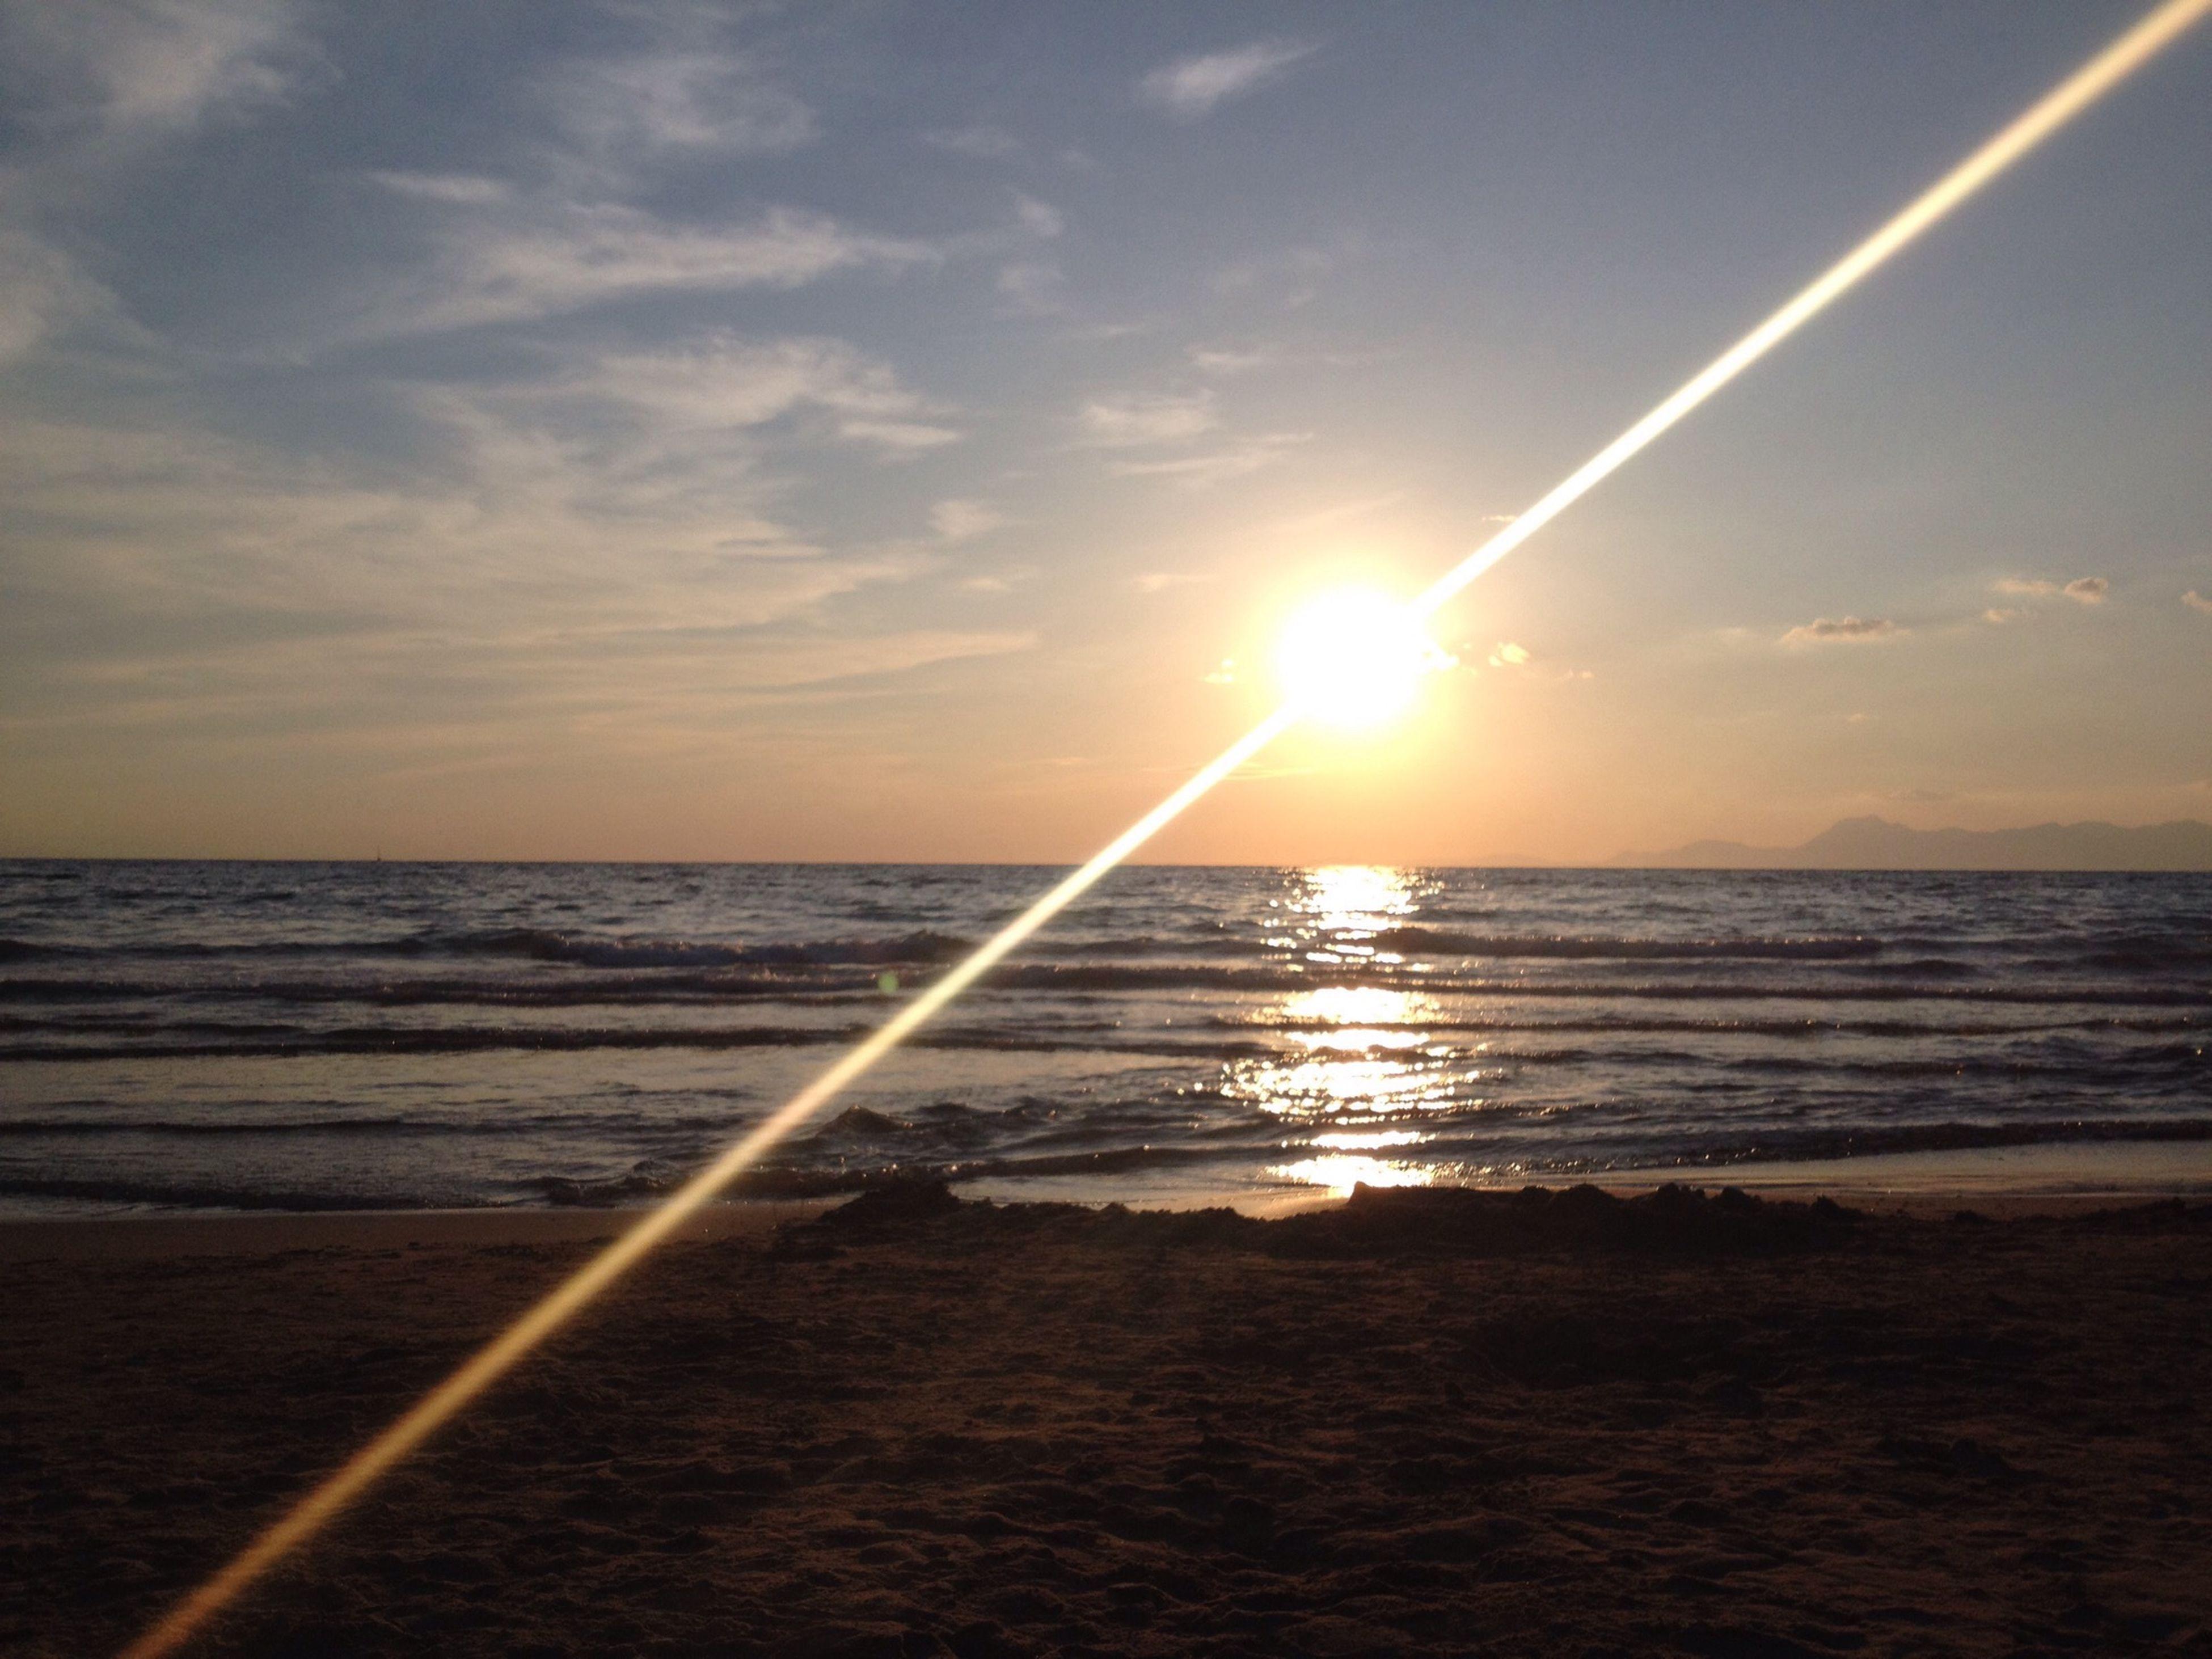 sea, sun, horizon over water, water, sunset, sky, scenics, beach, tranquil scene, beauty in nature, tranquility, shore, sunbeam, sunlight, reflection, idyllic, nature, cloud - sky, lens flare, wave